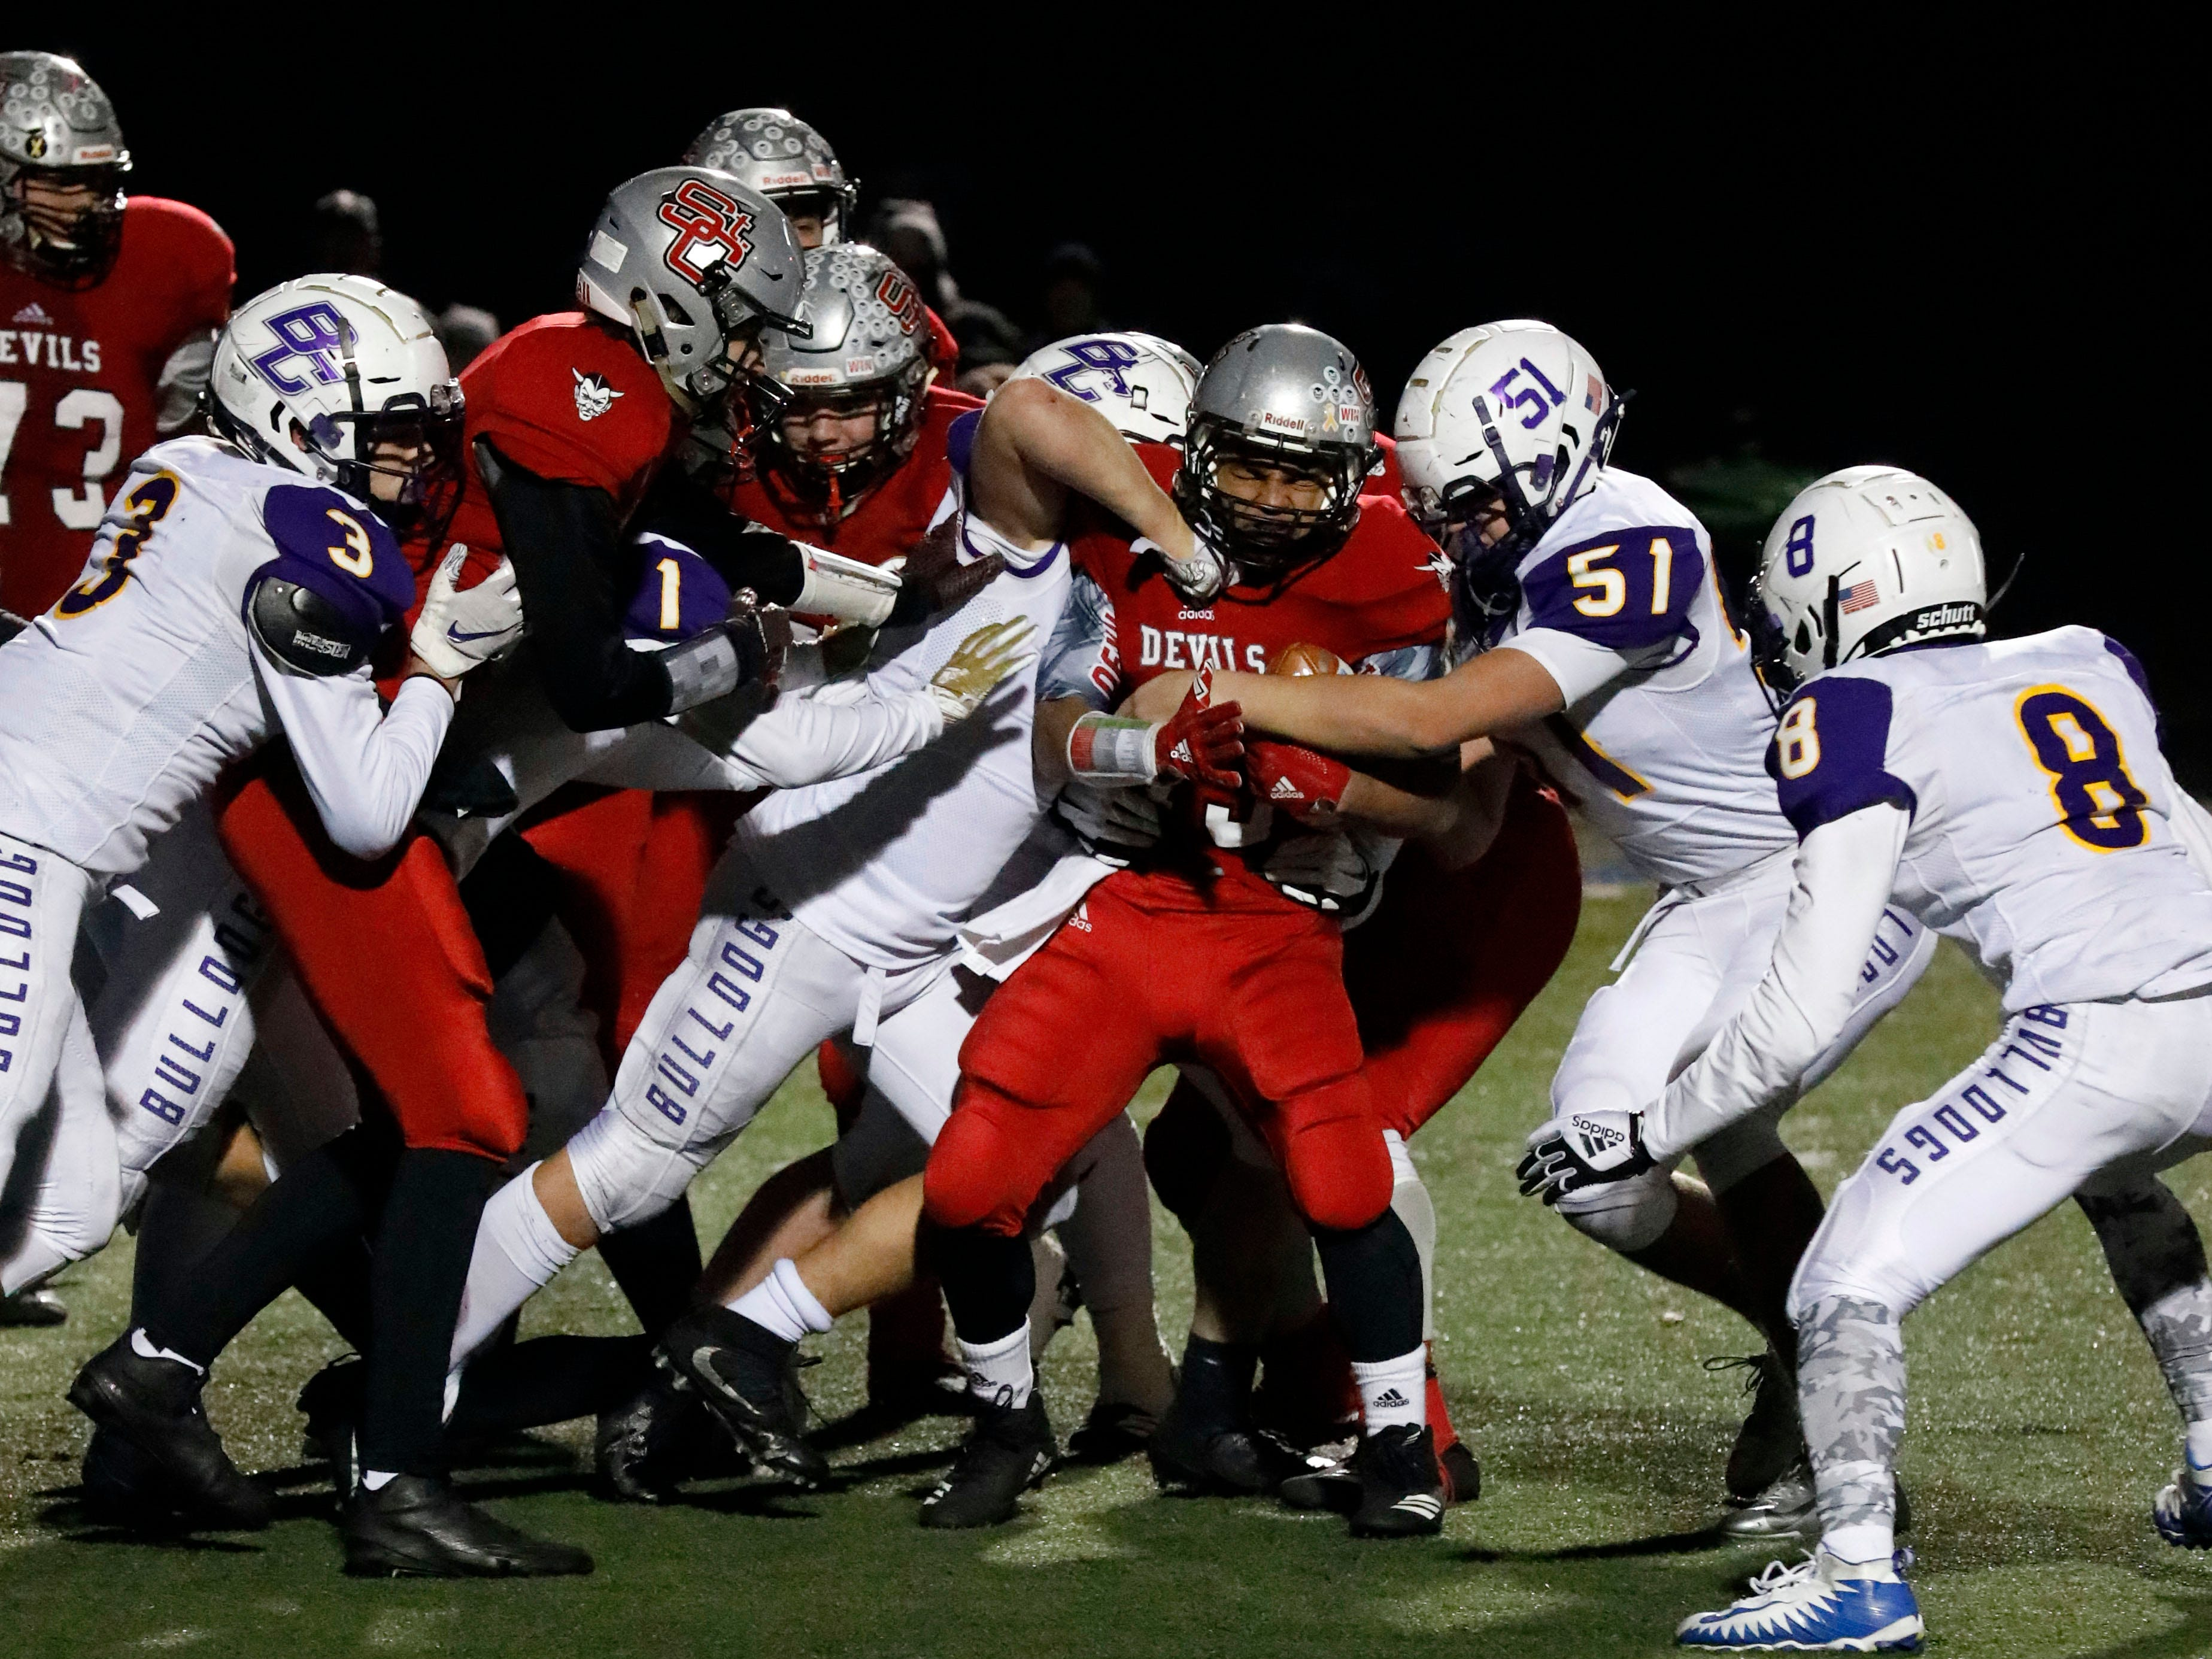 Bloom-Carroll lost a regional semifinal game to St. Clairsville Saturday night, Nov. 10, 2018, at Zanesville High School in Zanesville.